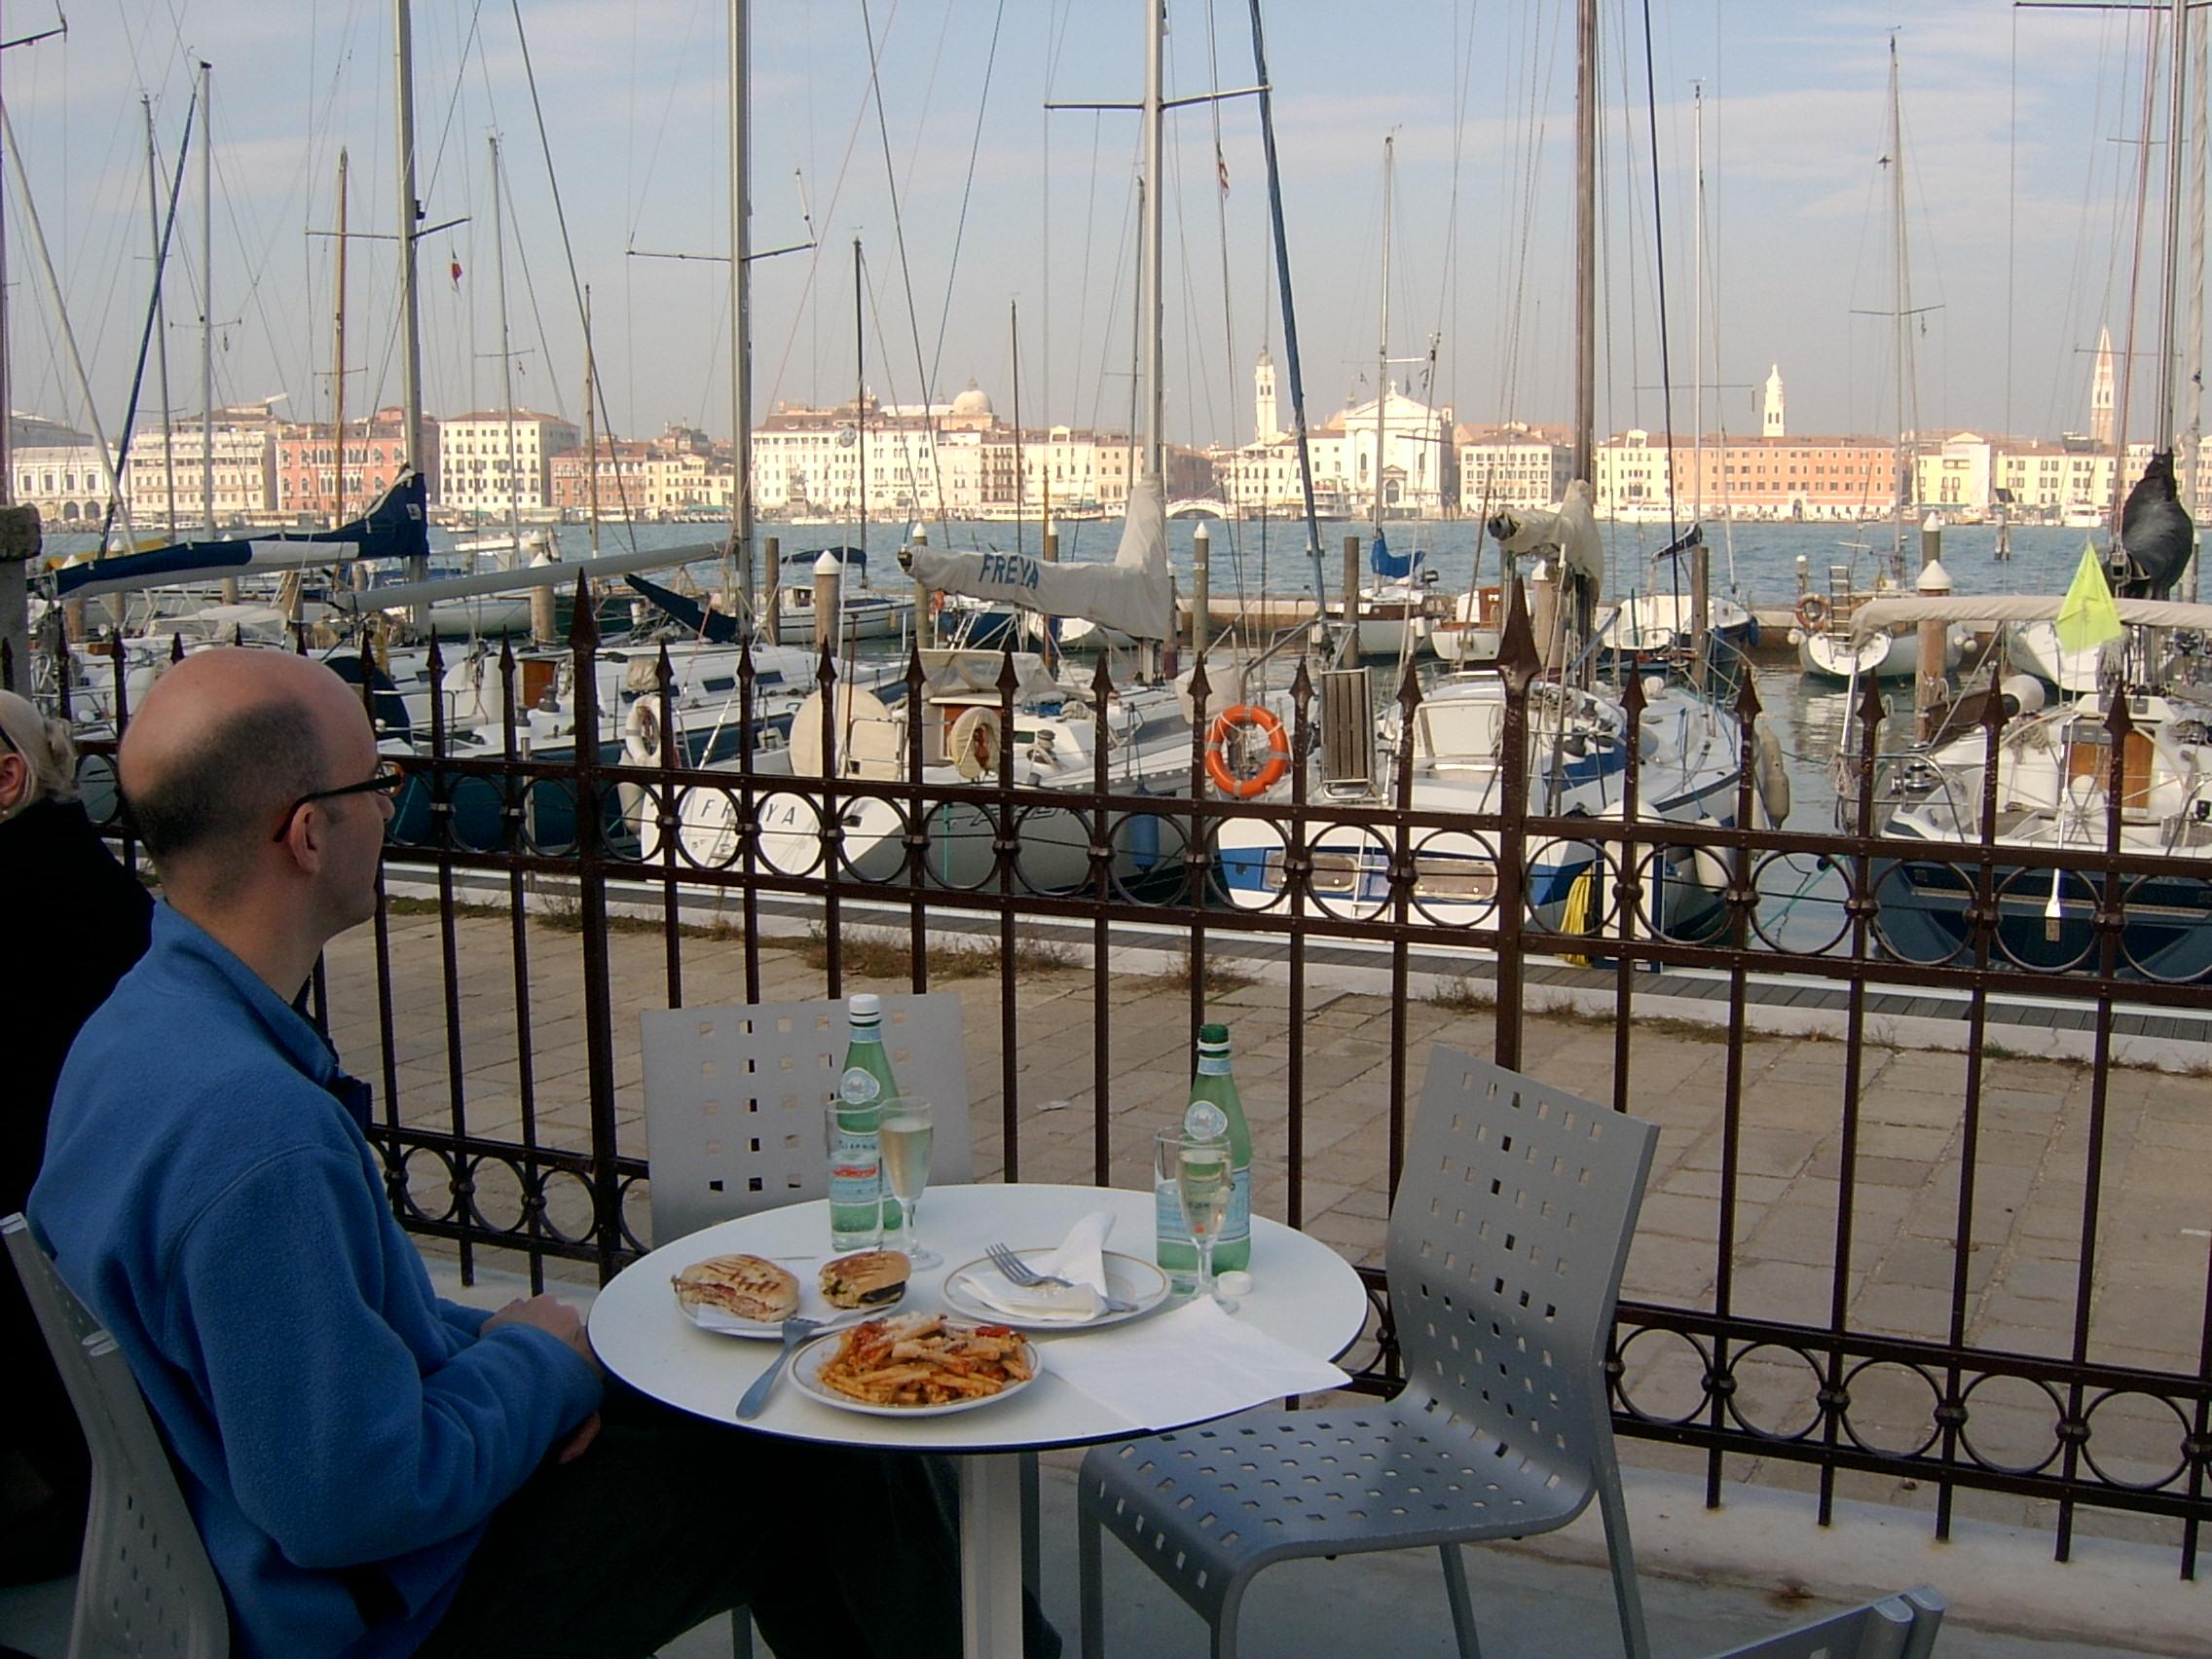 Drinking Prosecco in Venice, Italy